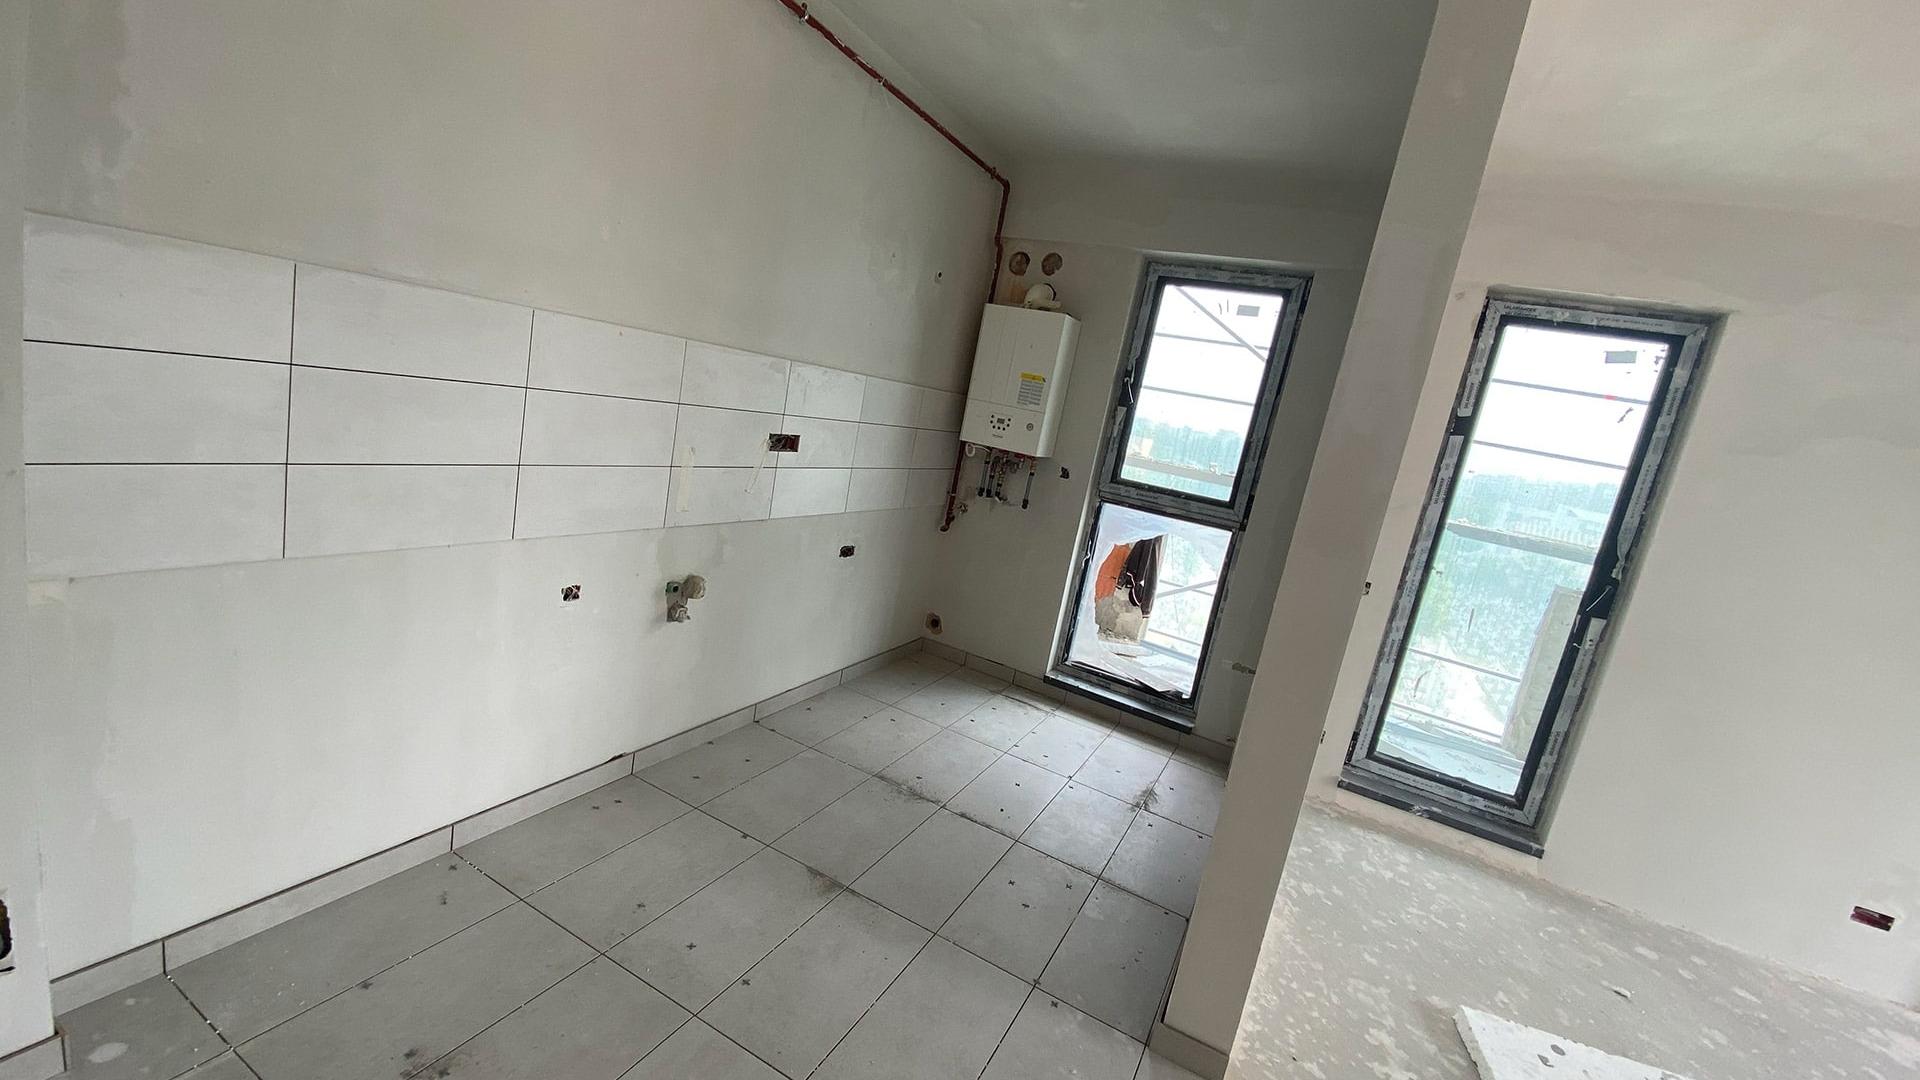 Stadiu executie Uverturii Residence 11 Mai 2020 - Apartamente si garsoniere de vanzare Militari, Gorjului - 4